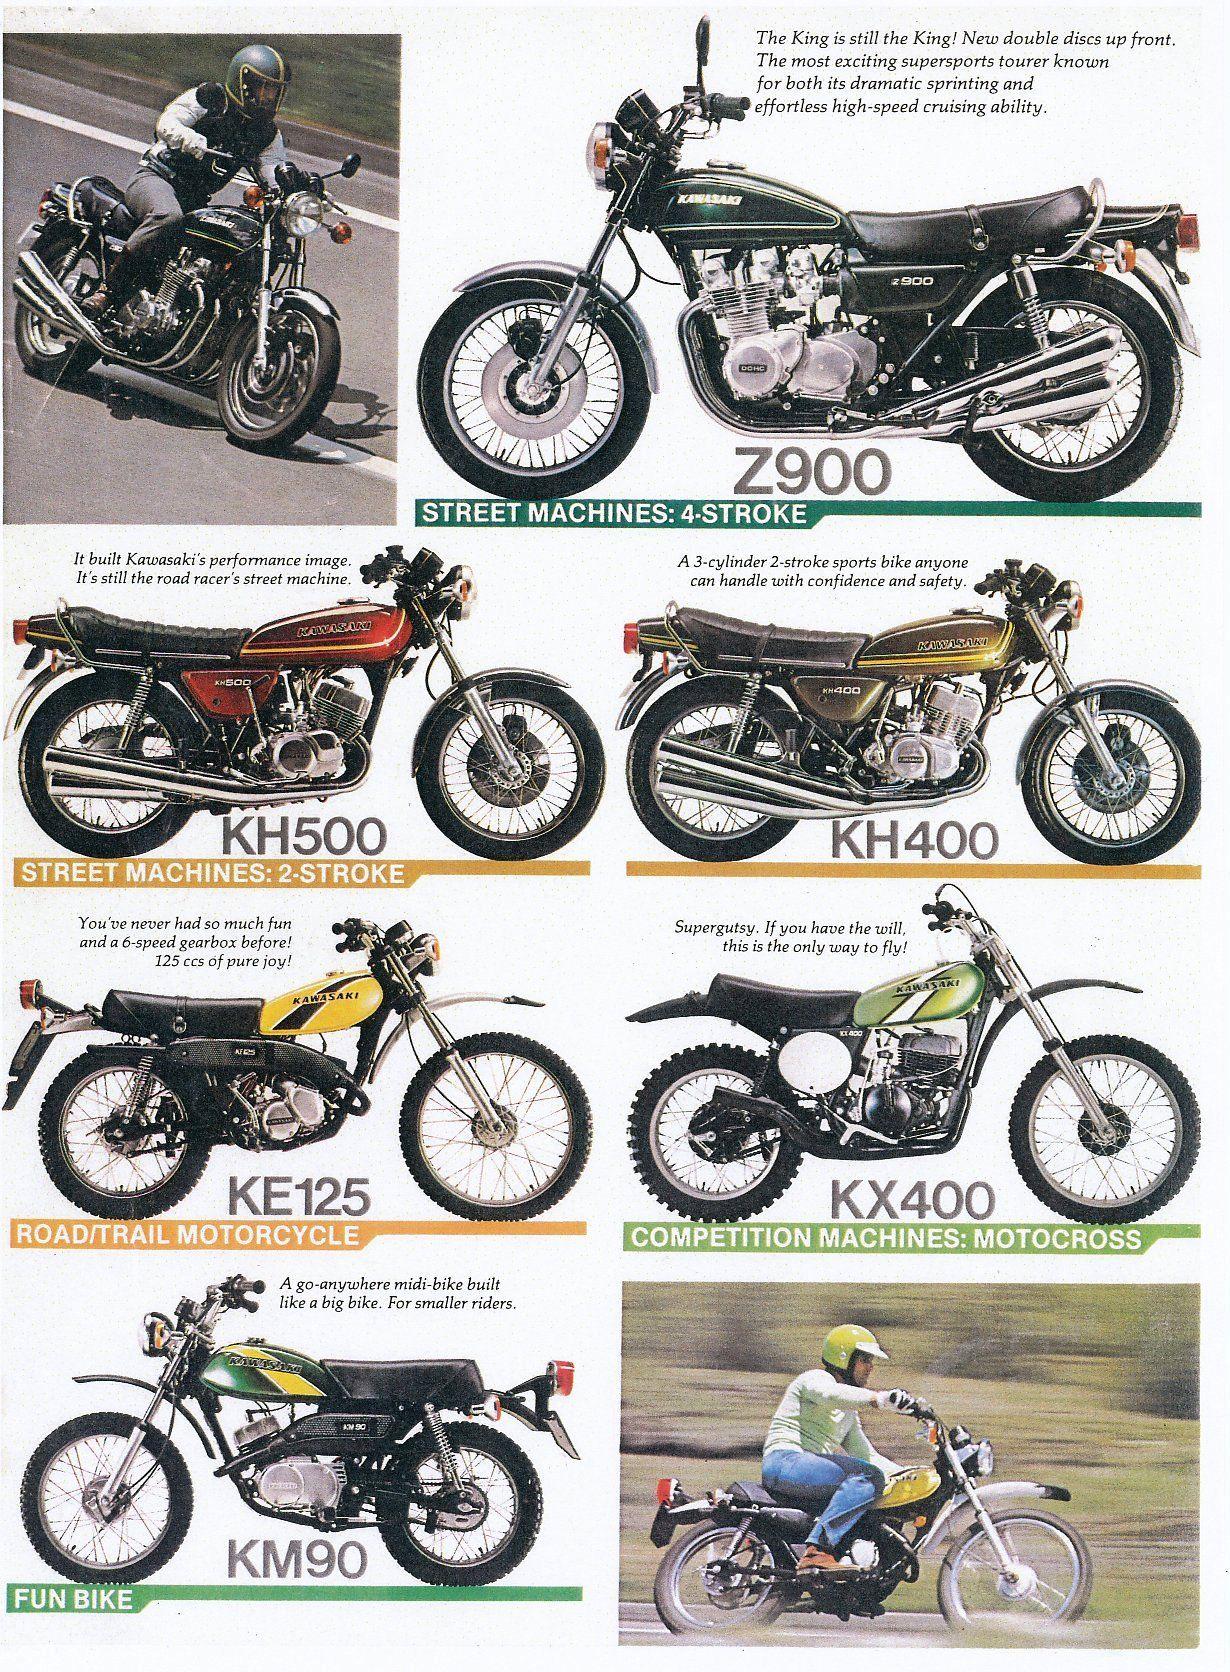 Kawasaki 1976 1/2 https://plus.google.com/+ ...